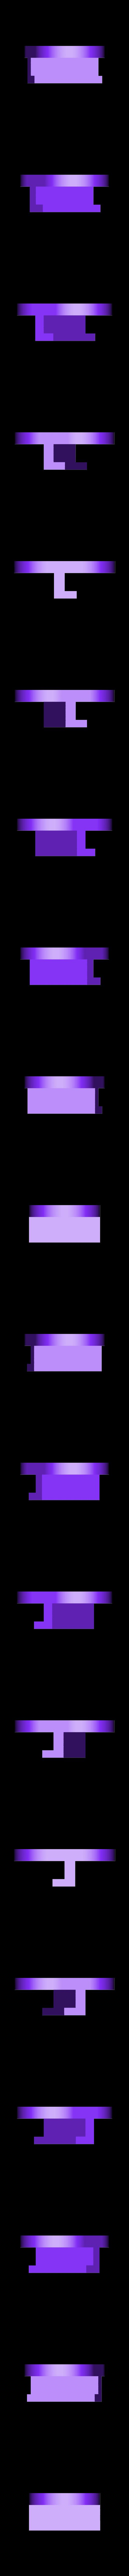 Batmobile_wall_mount_long.stl Download free SCAD file Lego Batmobile wall mount • 3D printable template, yvrogne59